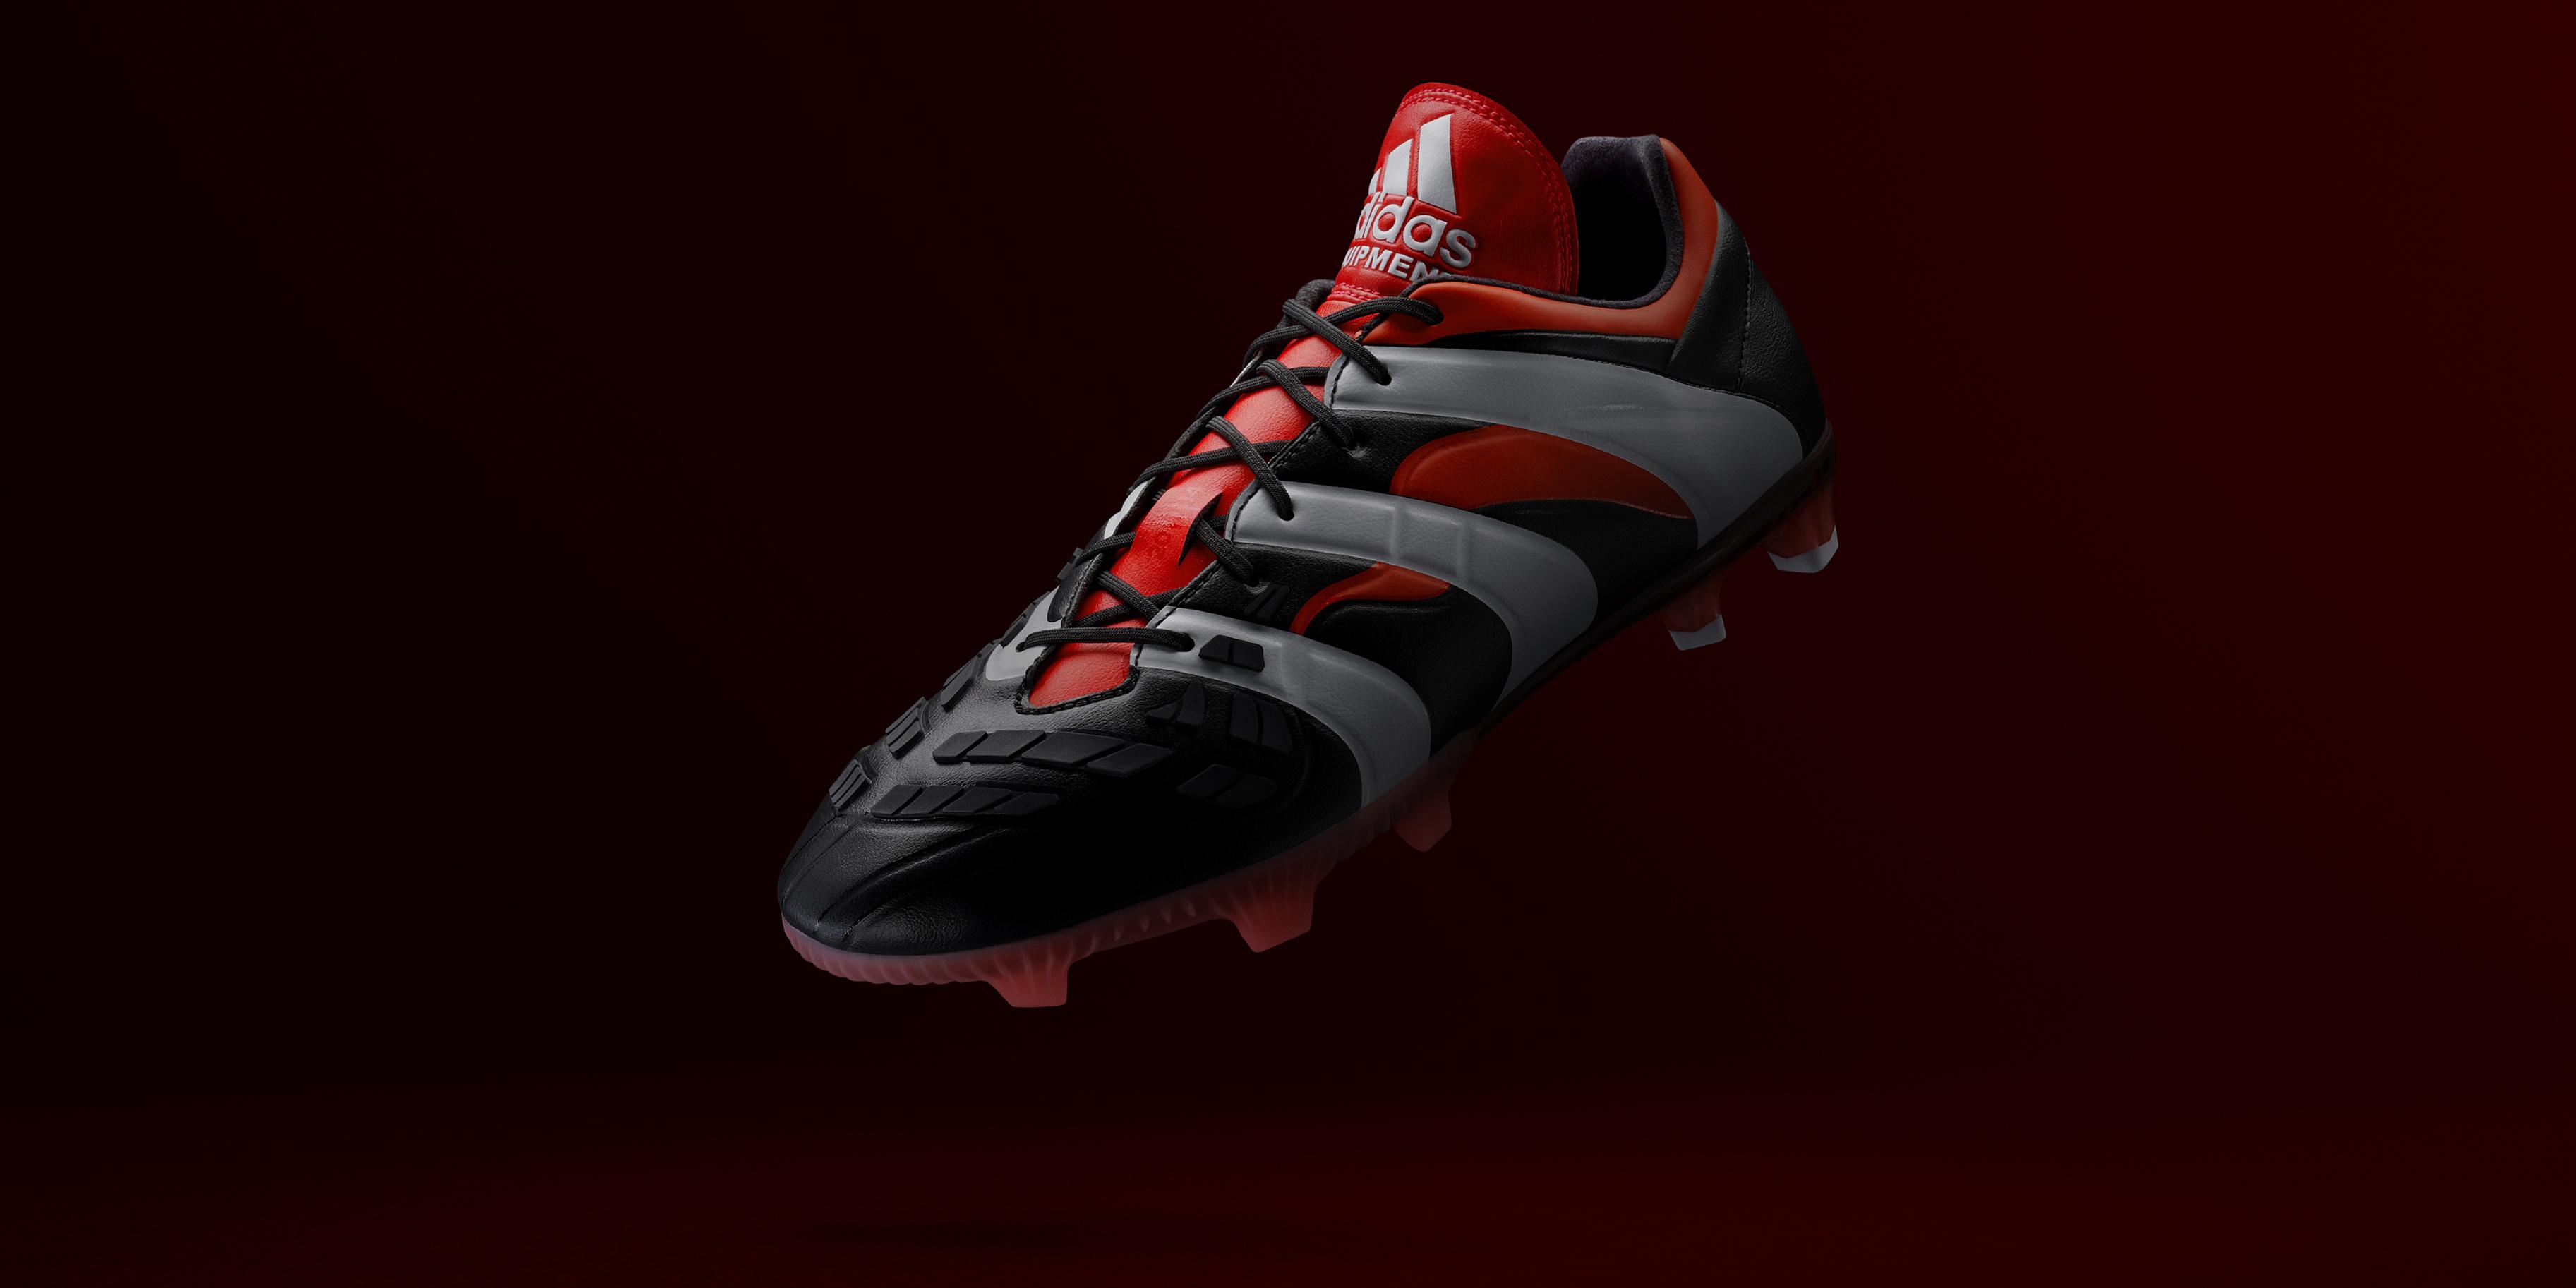 wholesale dealer 51cee e6812 ... hot low price adidas predator instinct accelerator 55431 4c3d5 04ac8  35898